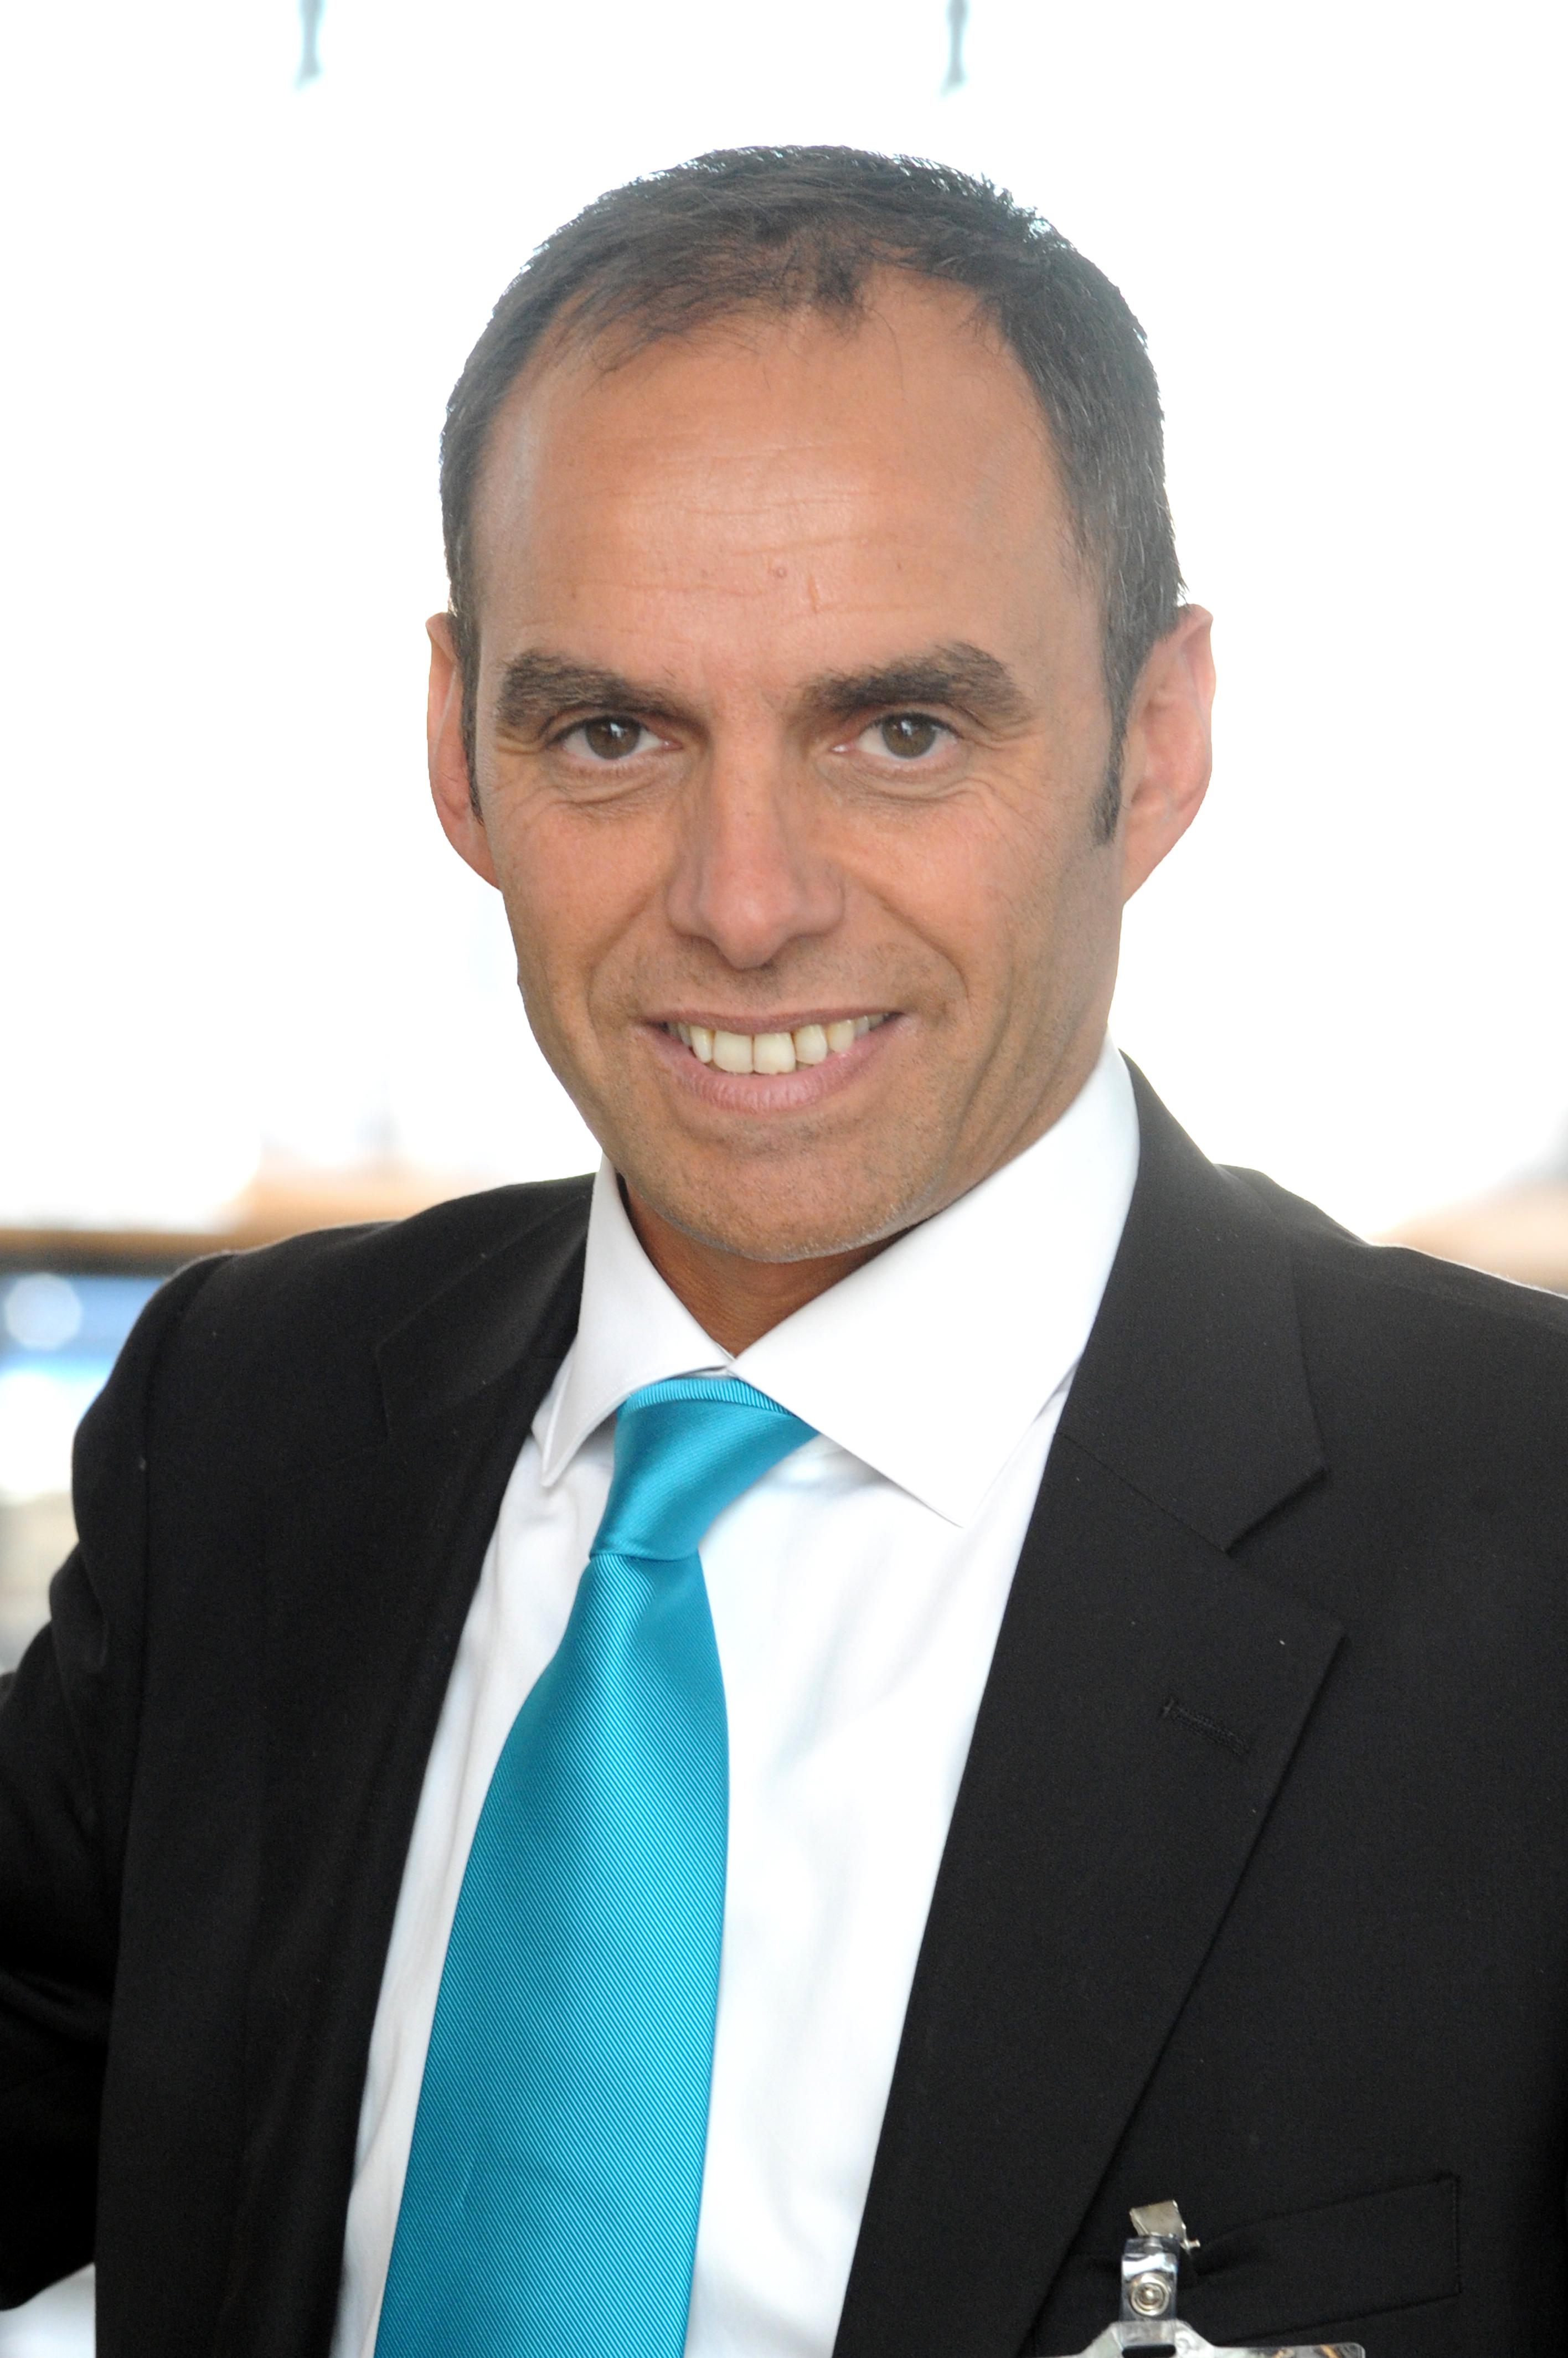 Daniel dahan direttore vendite benelux di farnell for Case logic italia